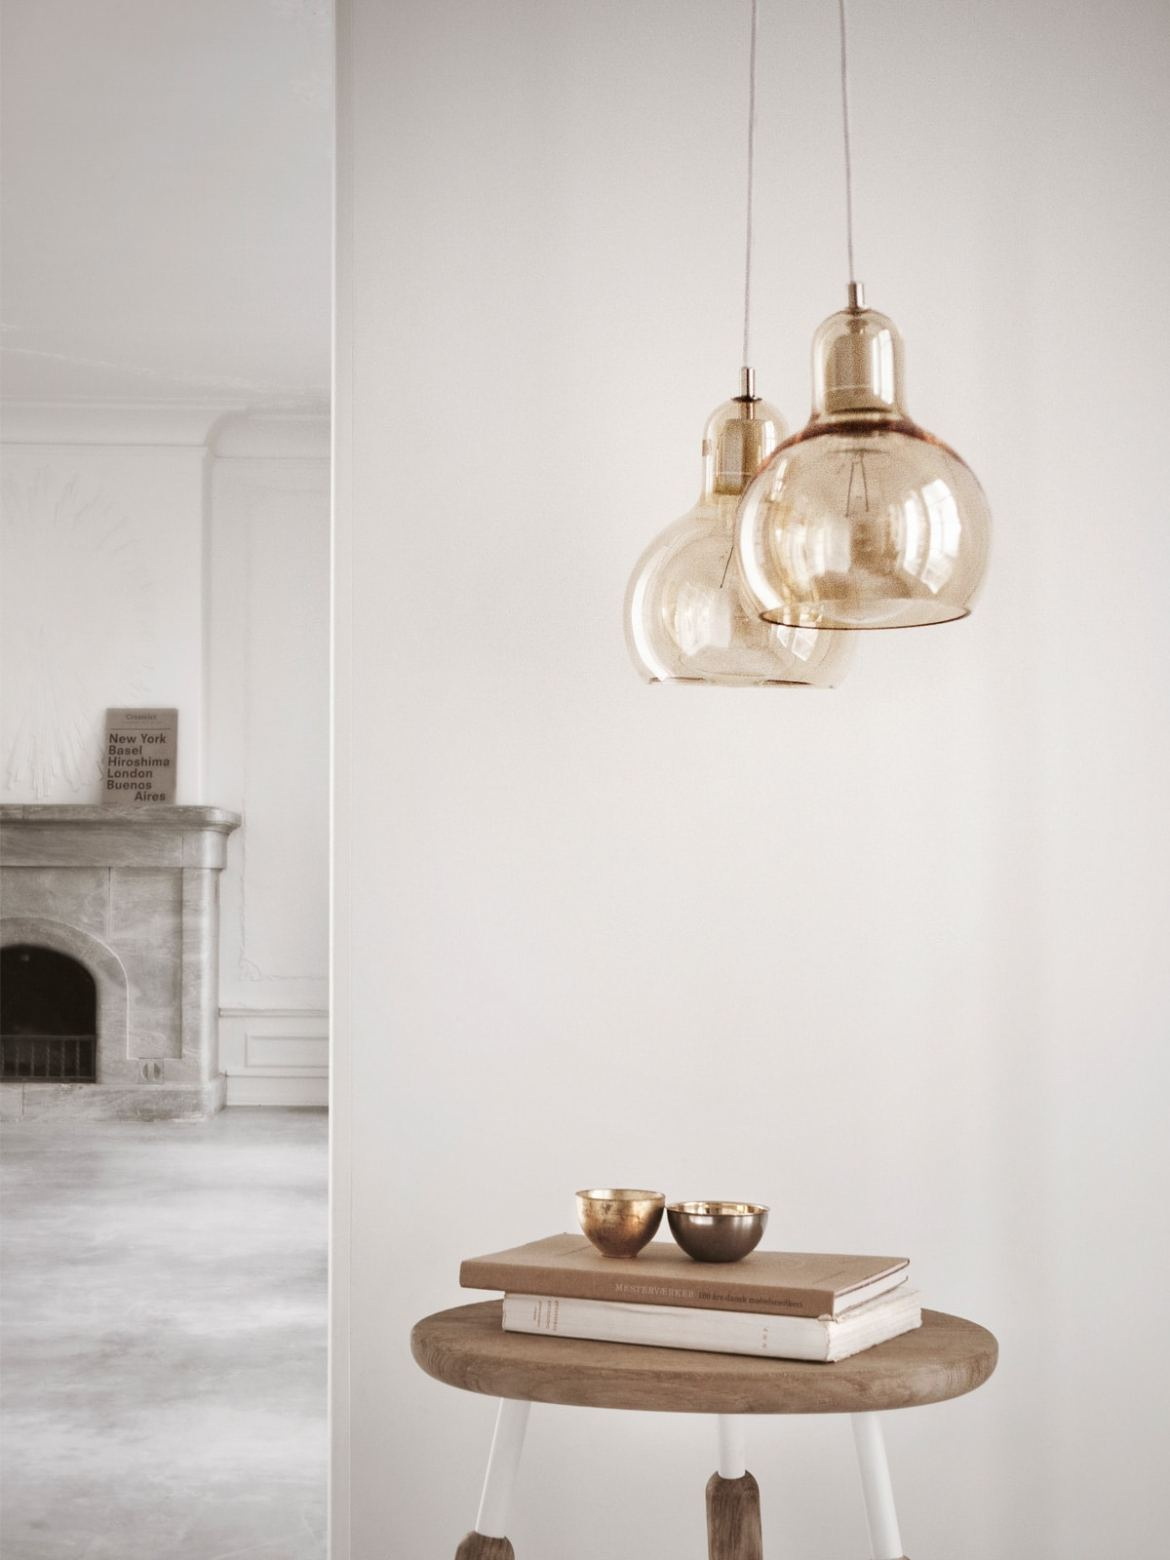 DesignOrt Blog: Pendelleuchten aus Glas &tradition Mega Bulb in Gold